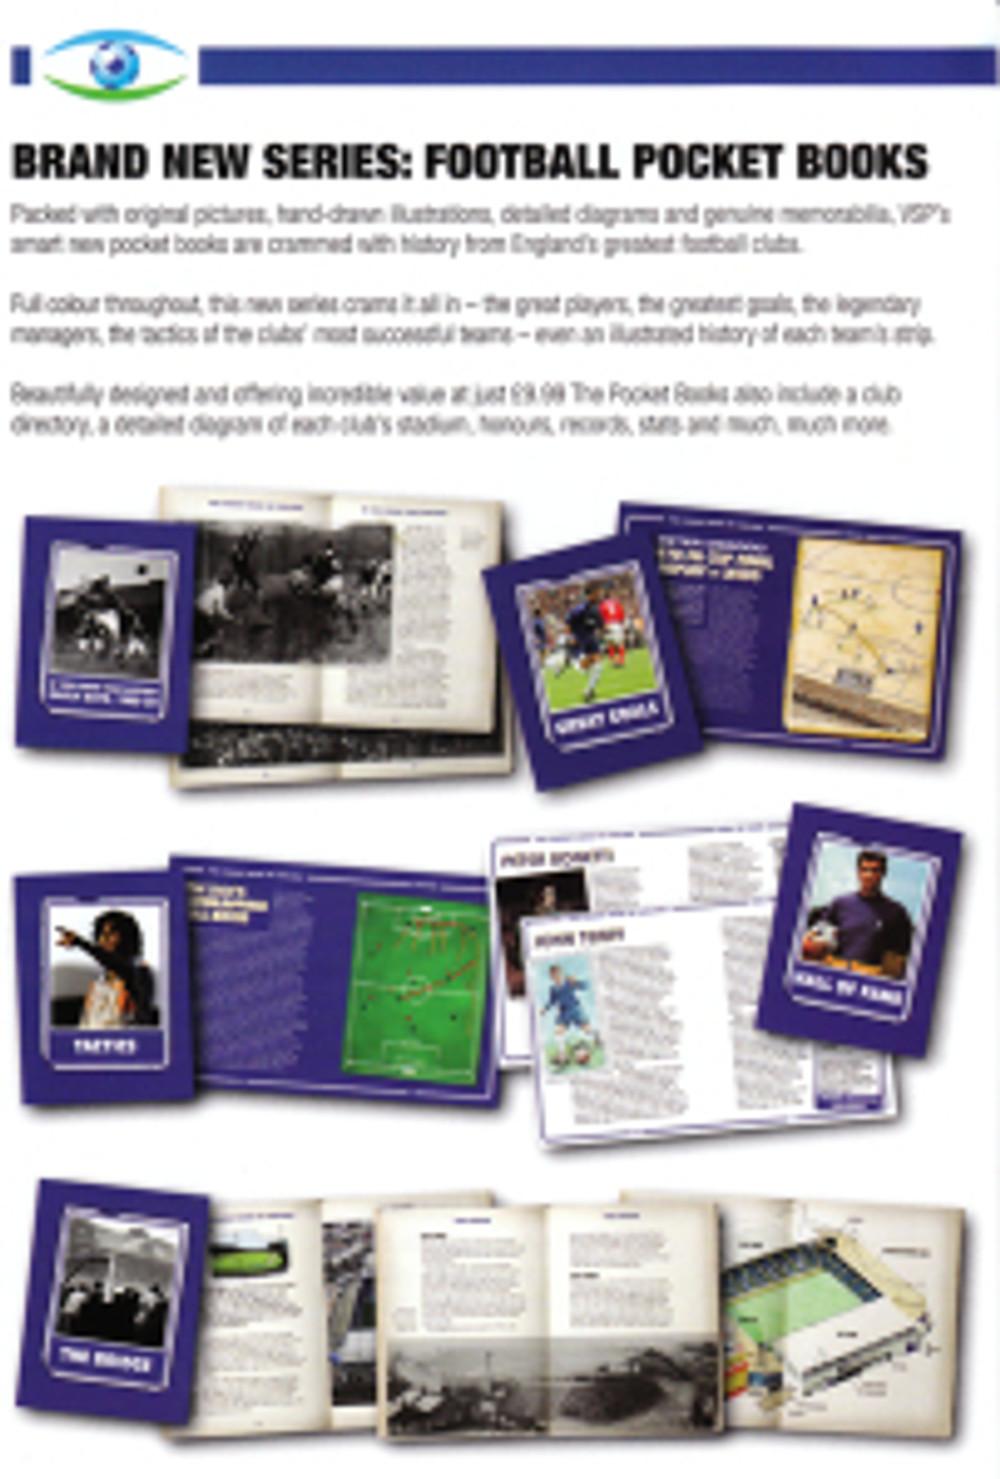 VSP Autumn 2009 catalogue page showing Pocket books